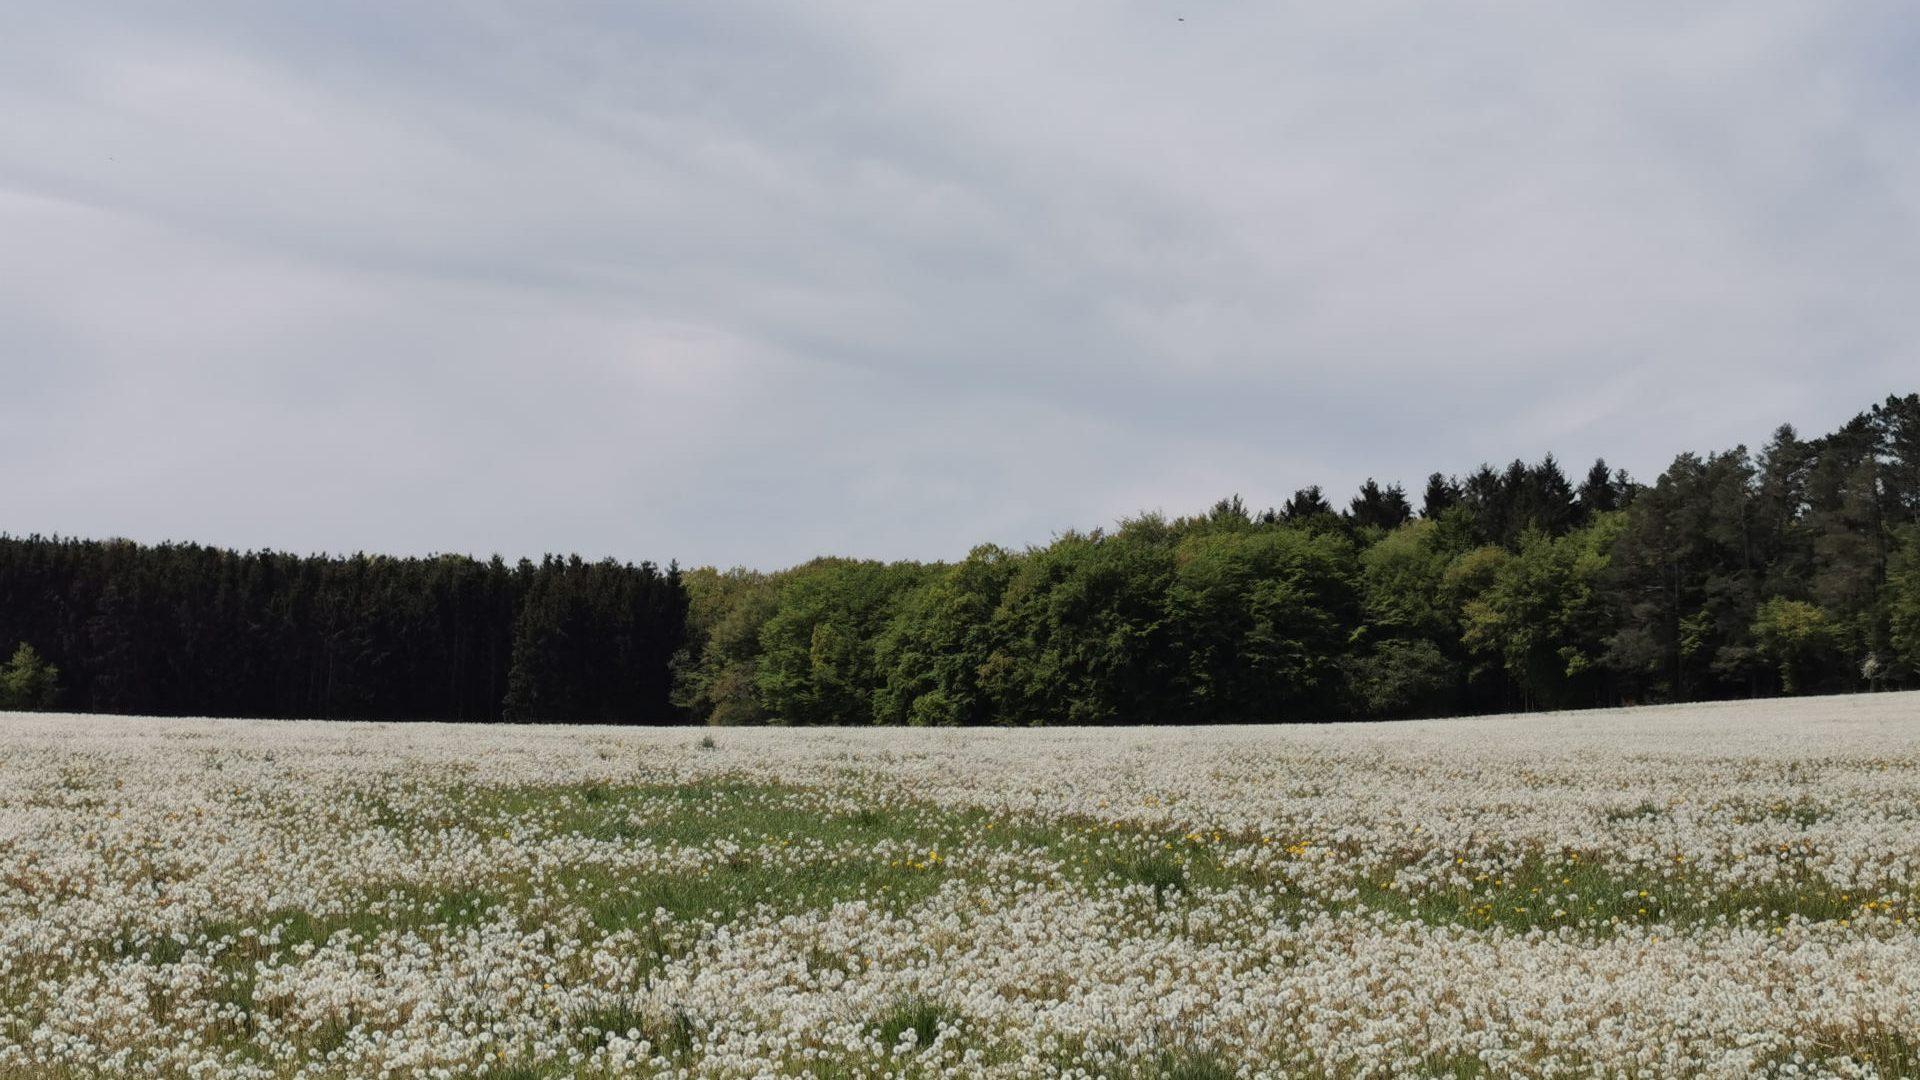 Ferienhaus-Landhaus-Loogh-Umgebung-Üxheim-Leudersdorf